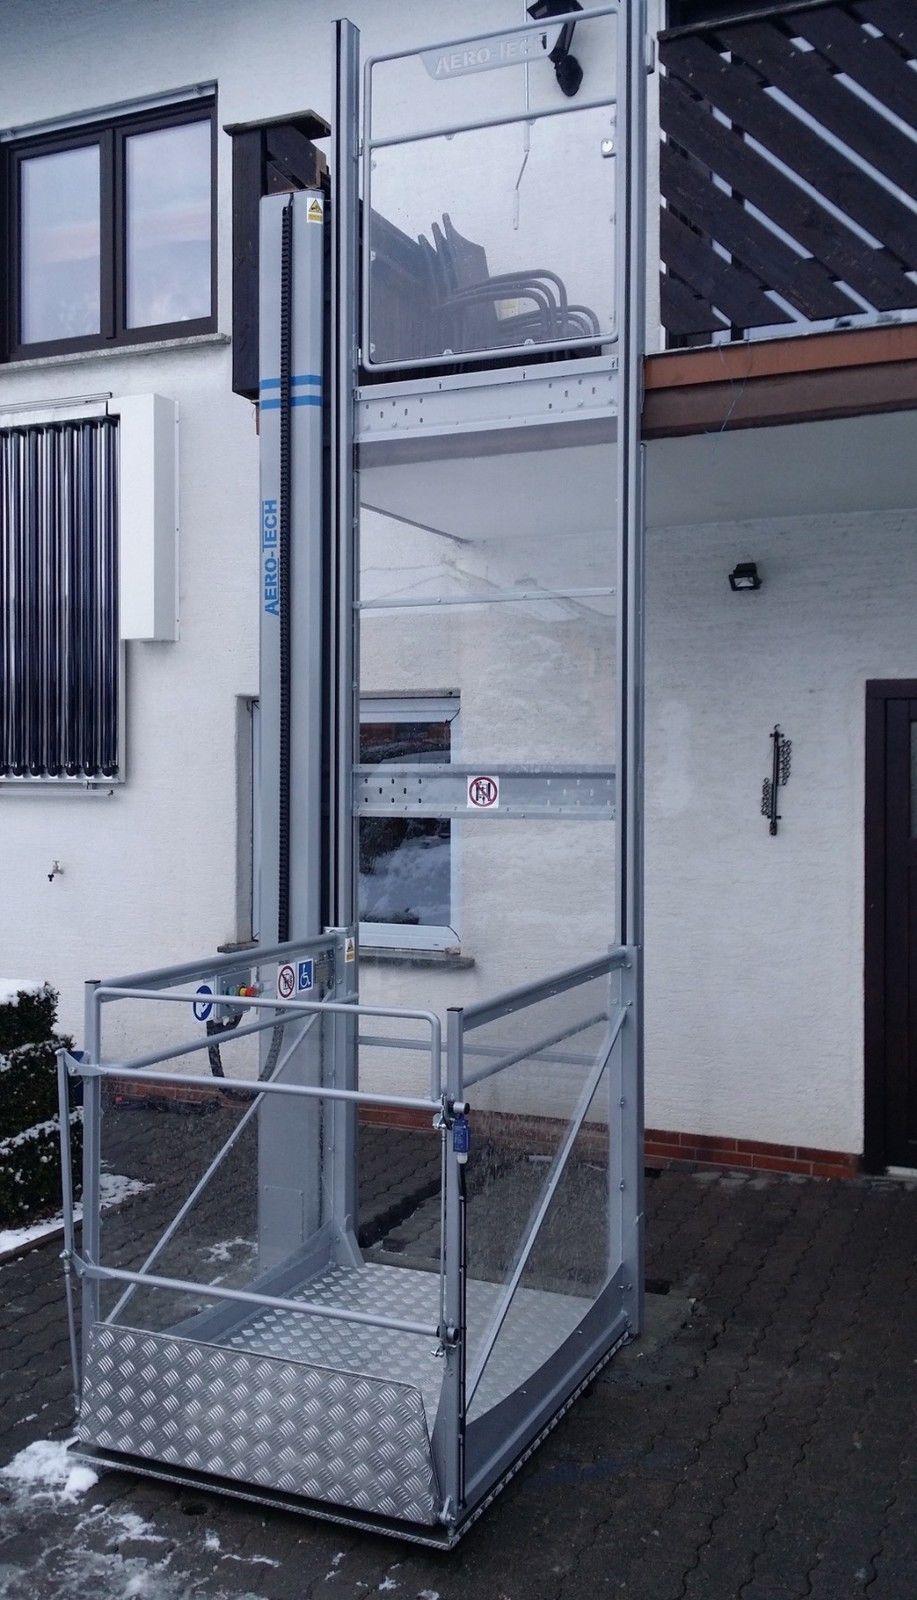 plattform aufzug fahrstuhl f r behinderte handicap. Black Bedroom Furniture Sets. Home Design Ideas